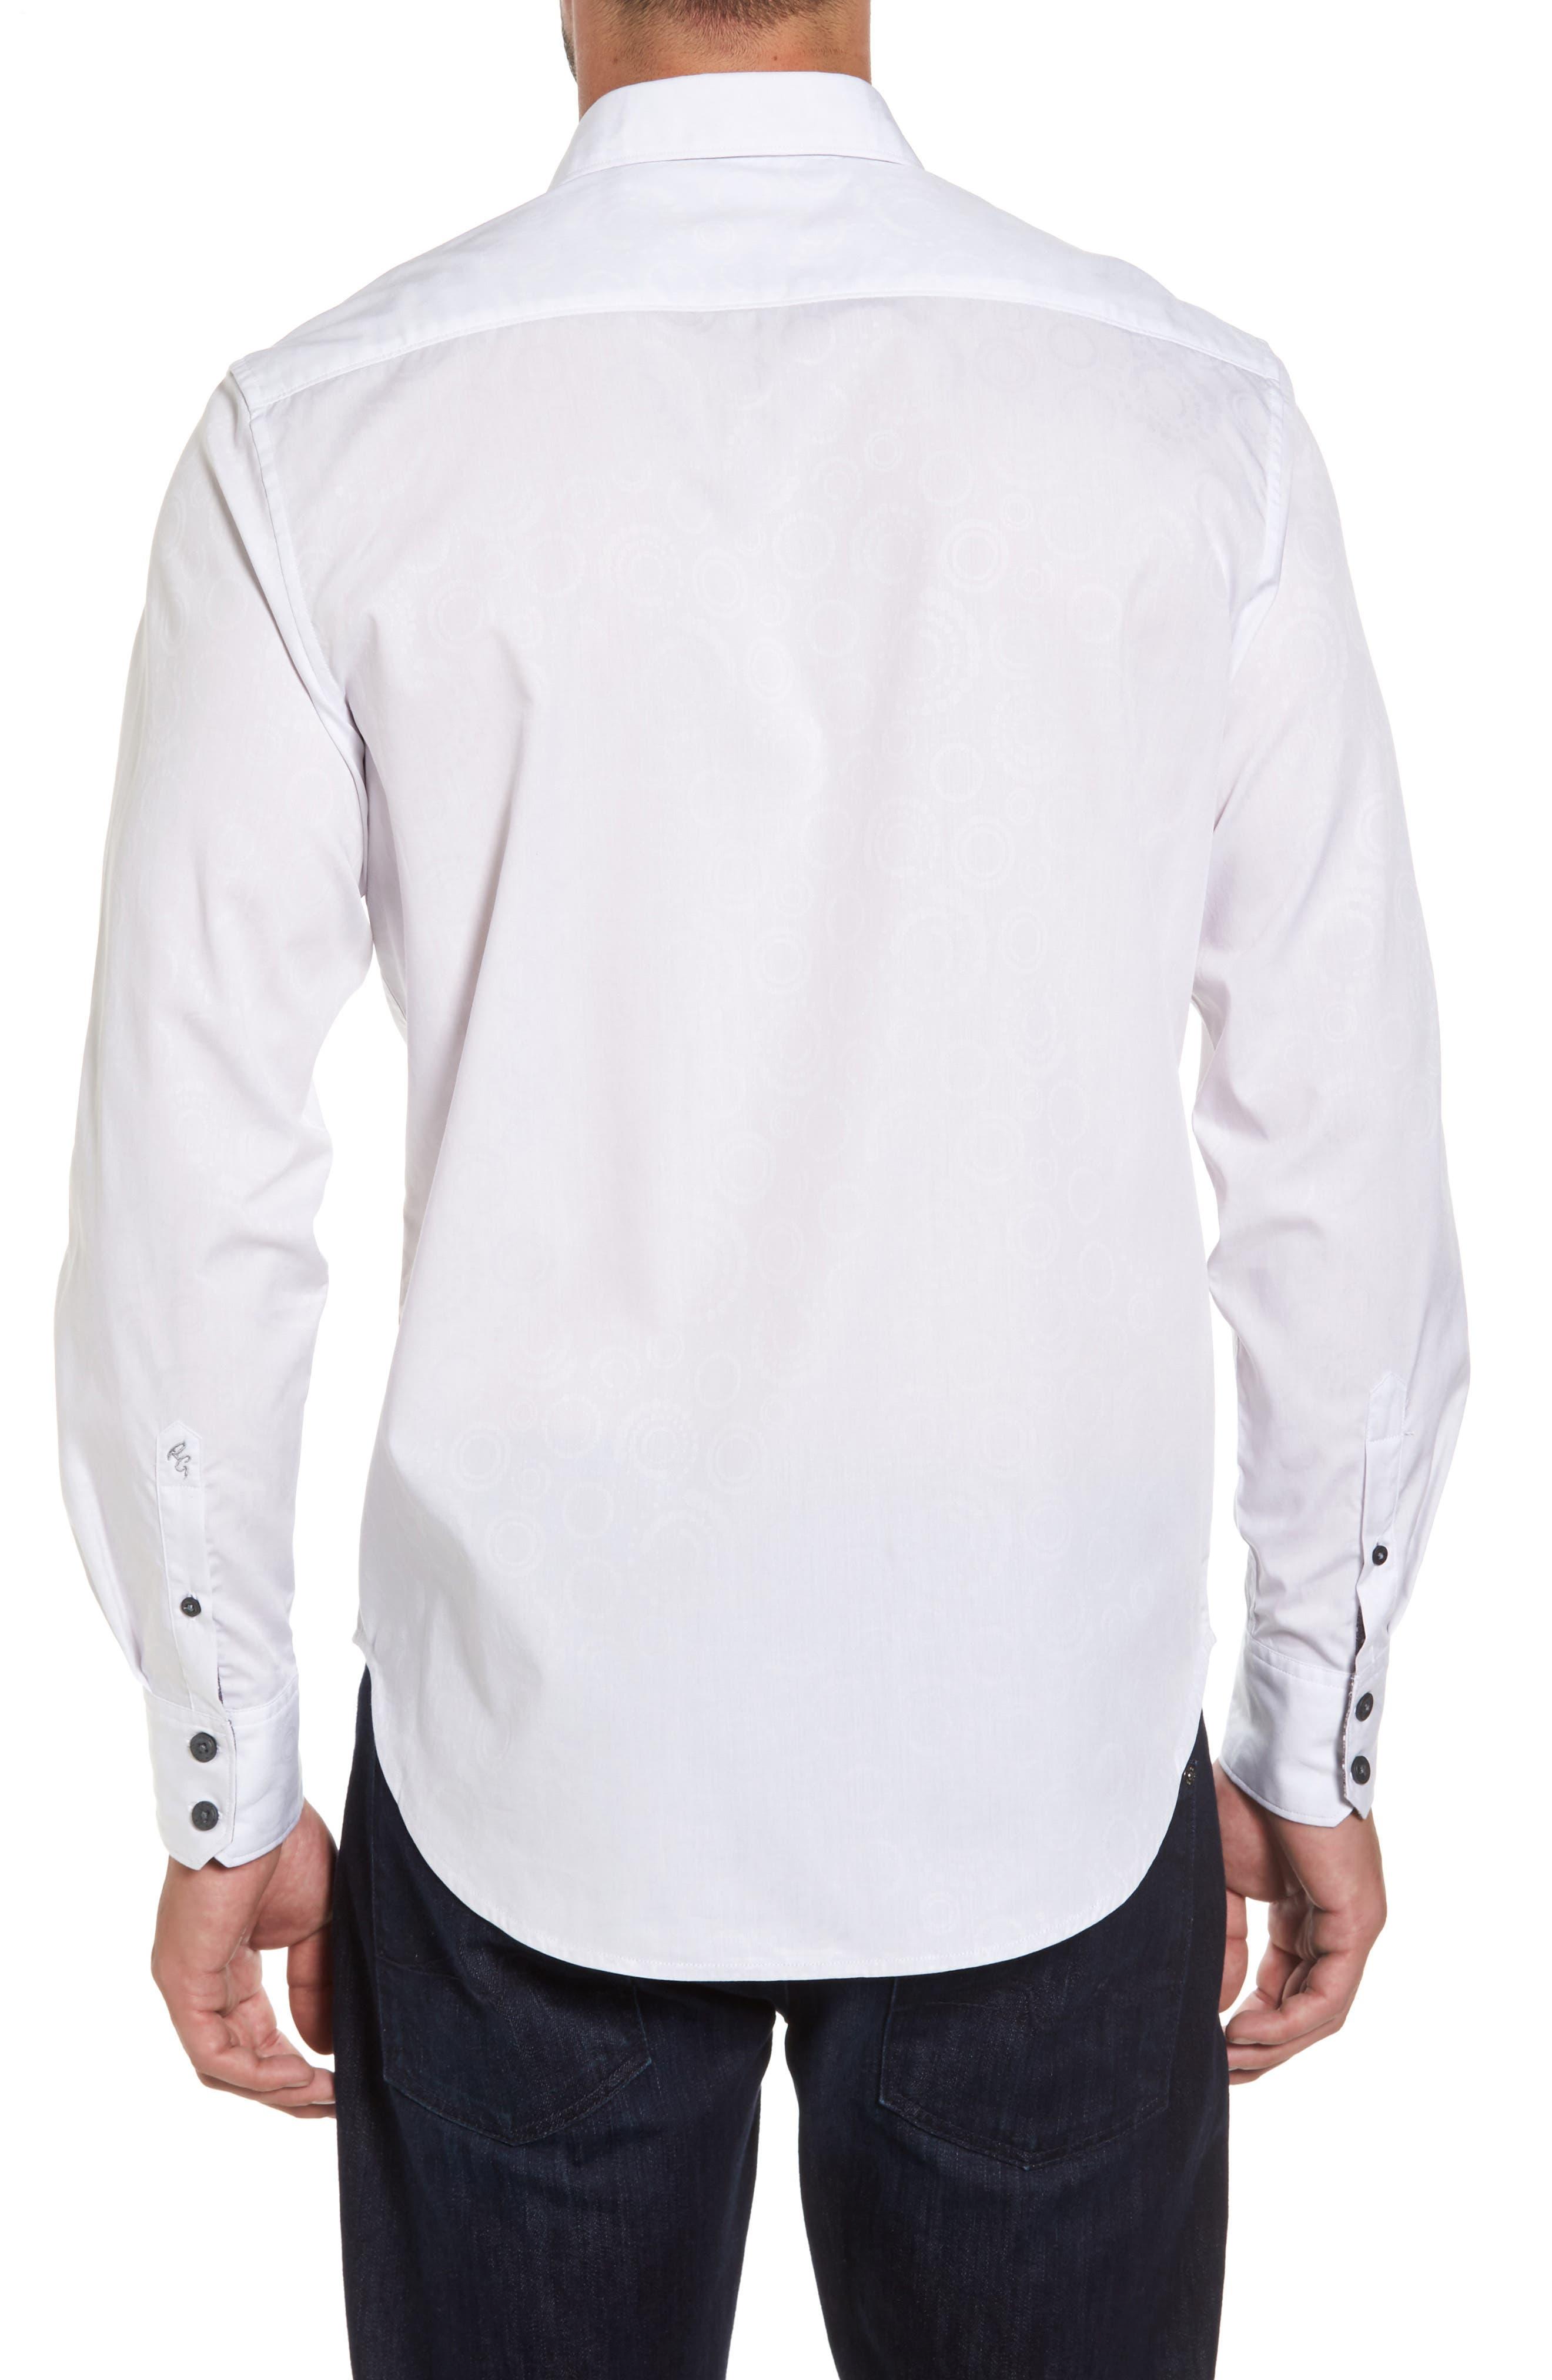 Binghampton Regular Fit Sport Shirt,                             Alternate thumbnail 2, color,                             White